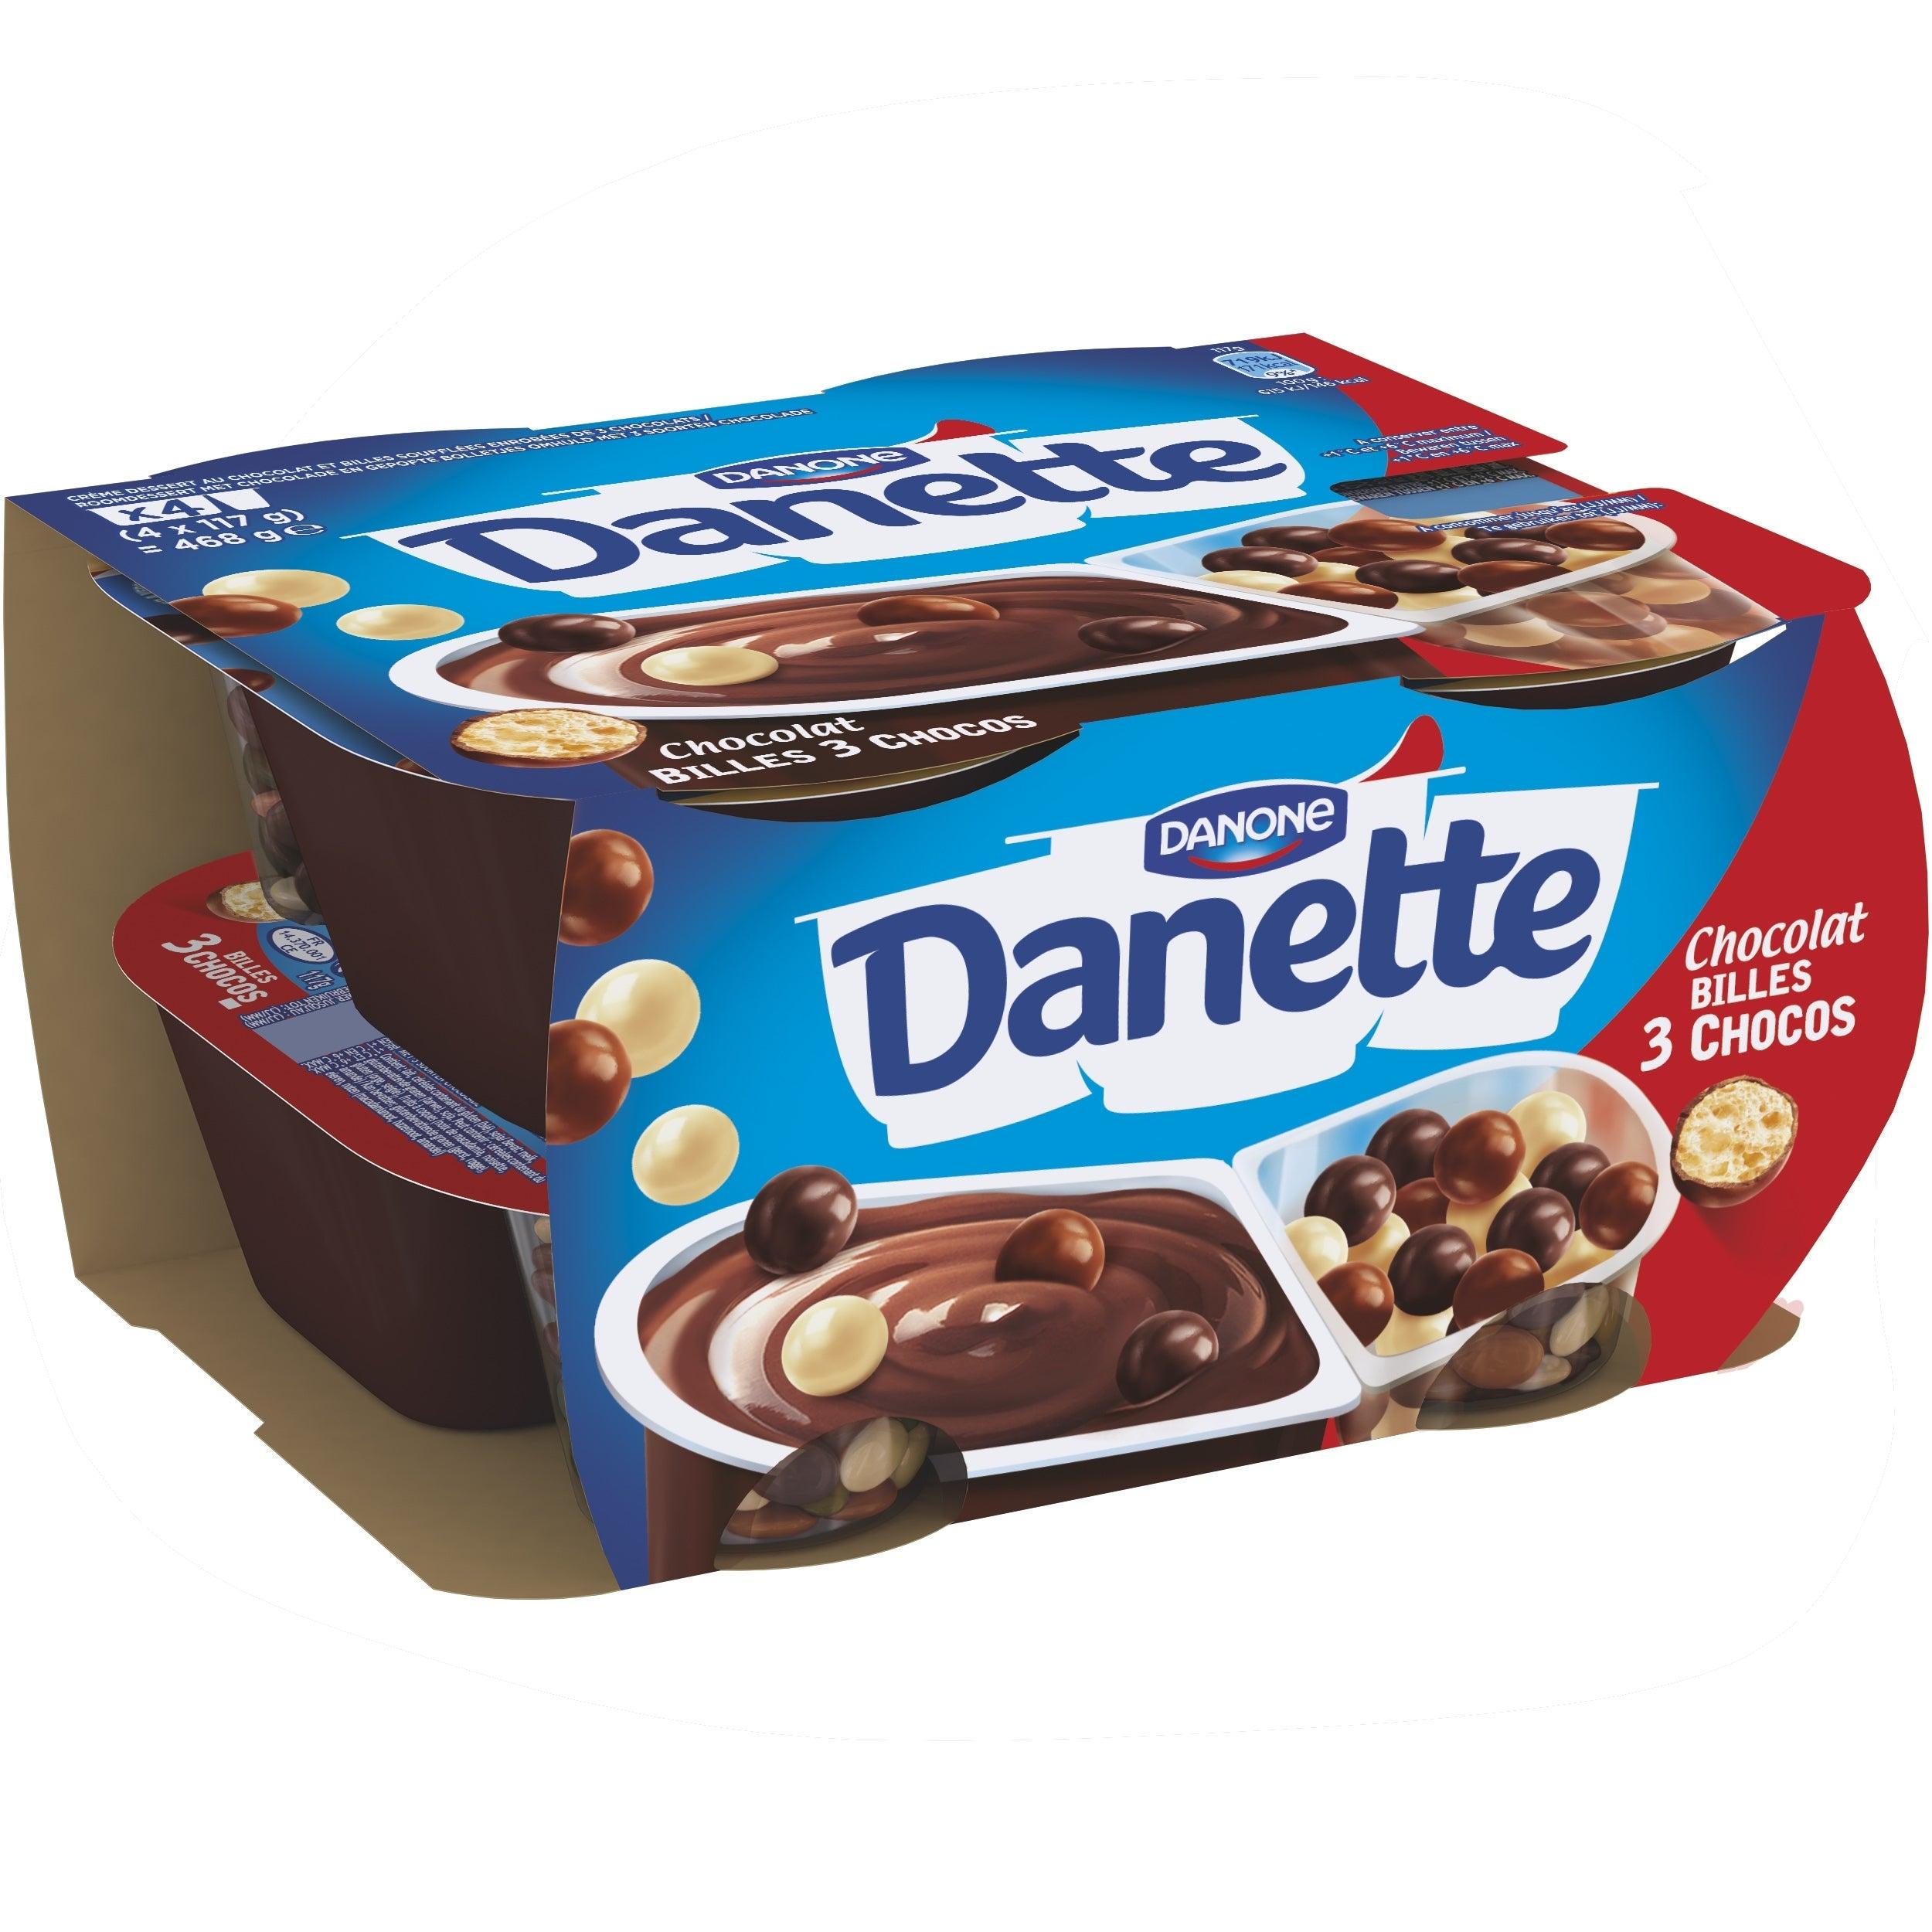 Danette POP Chocolat 4x117g